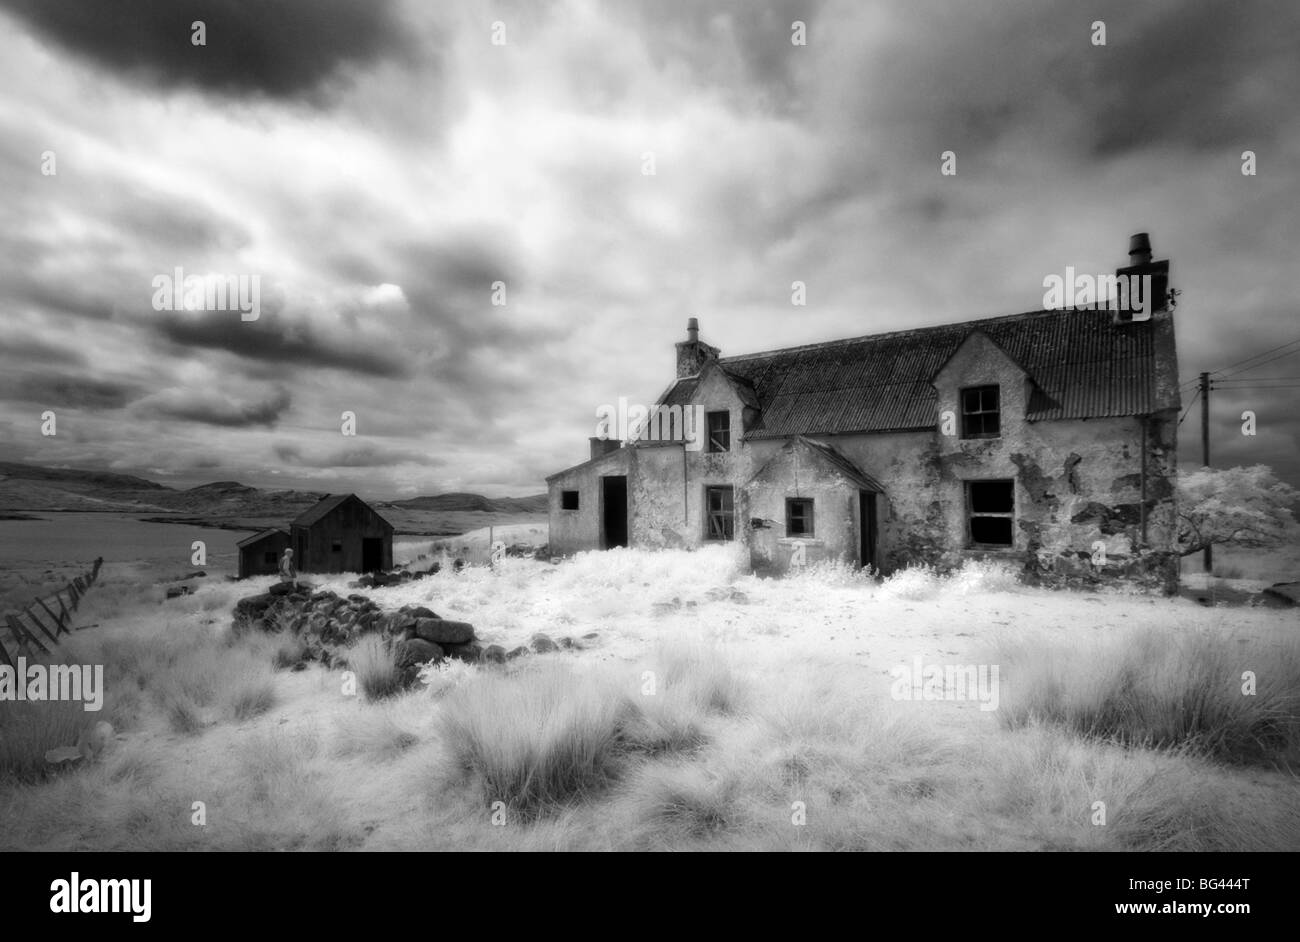 Infrared image of a derelict farmhouse near Arivruach, Isle of Lewis, Hebrides, Scotland, UK - Stock Image